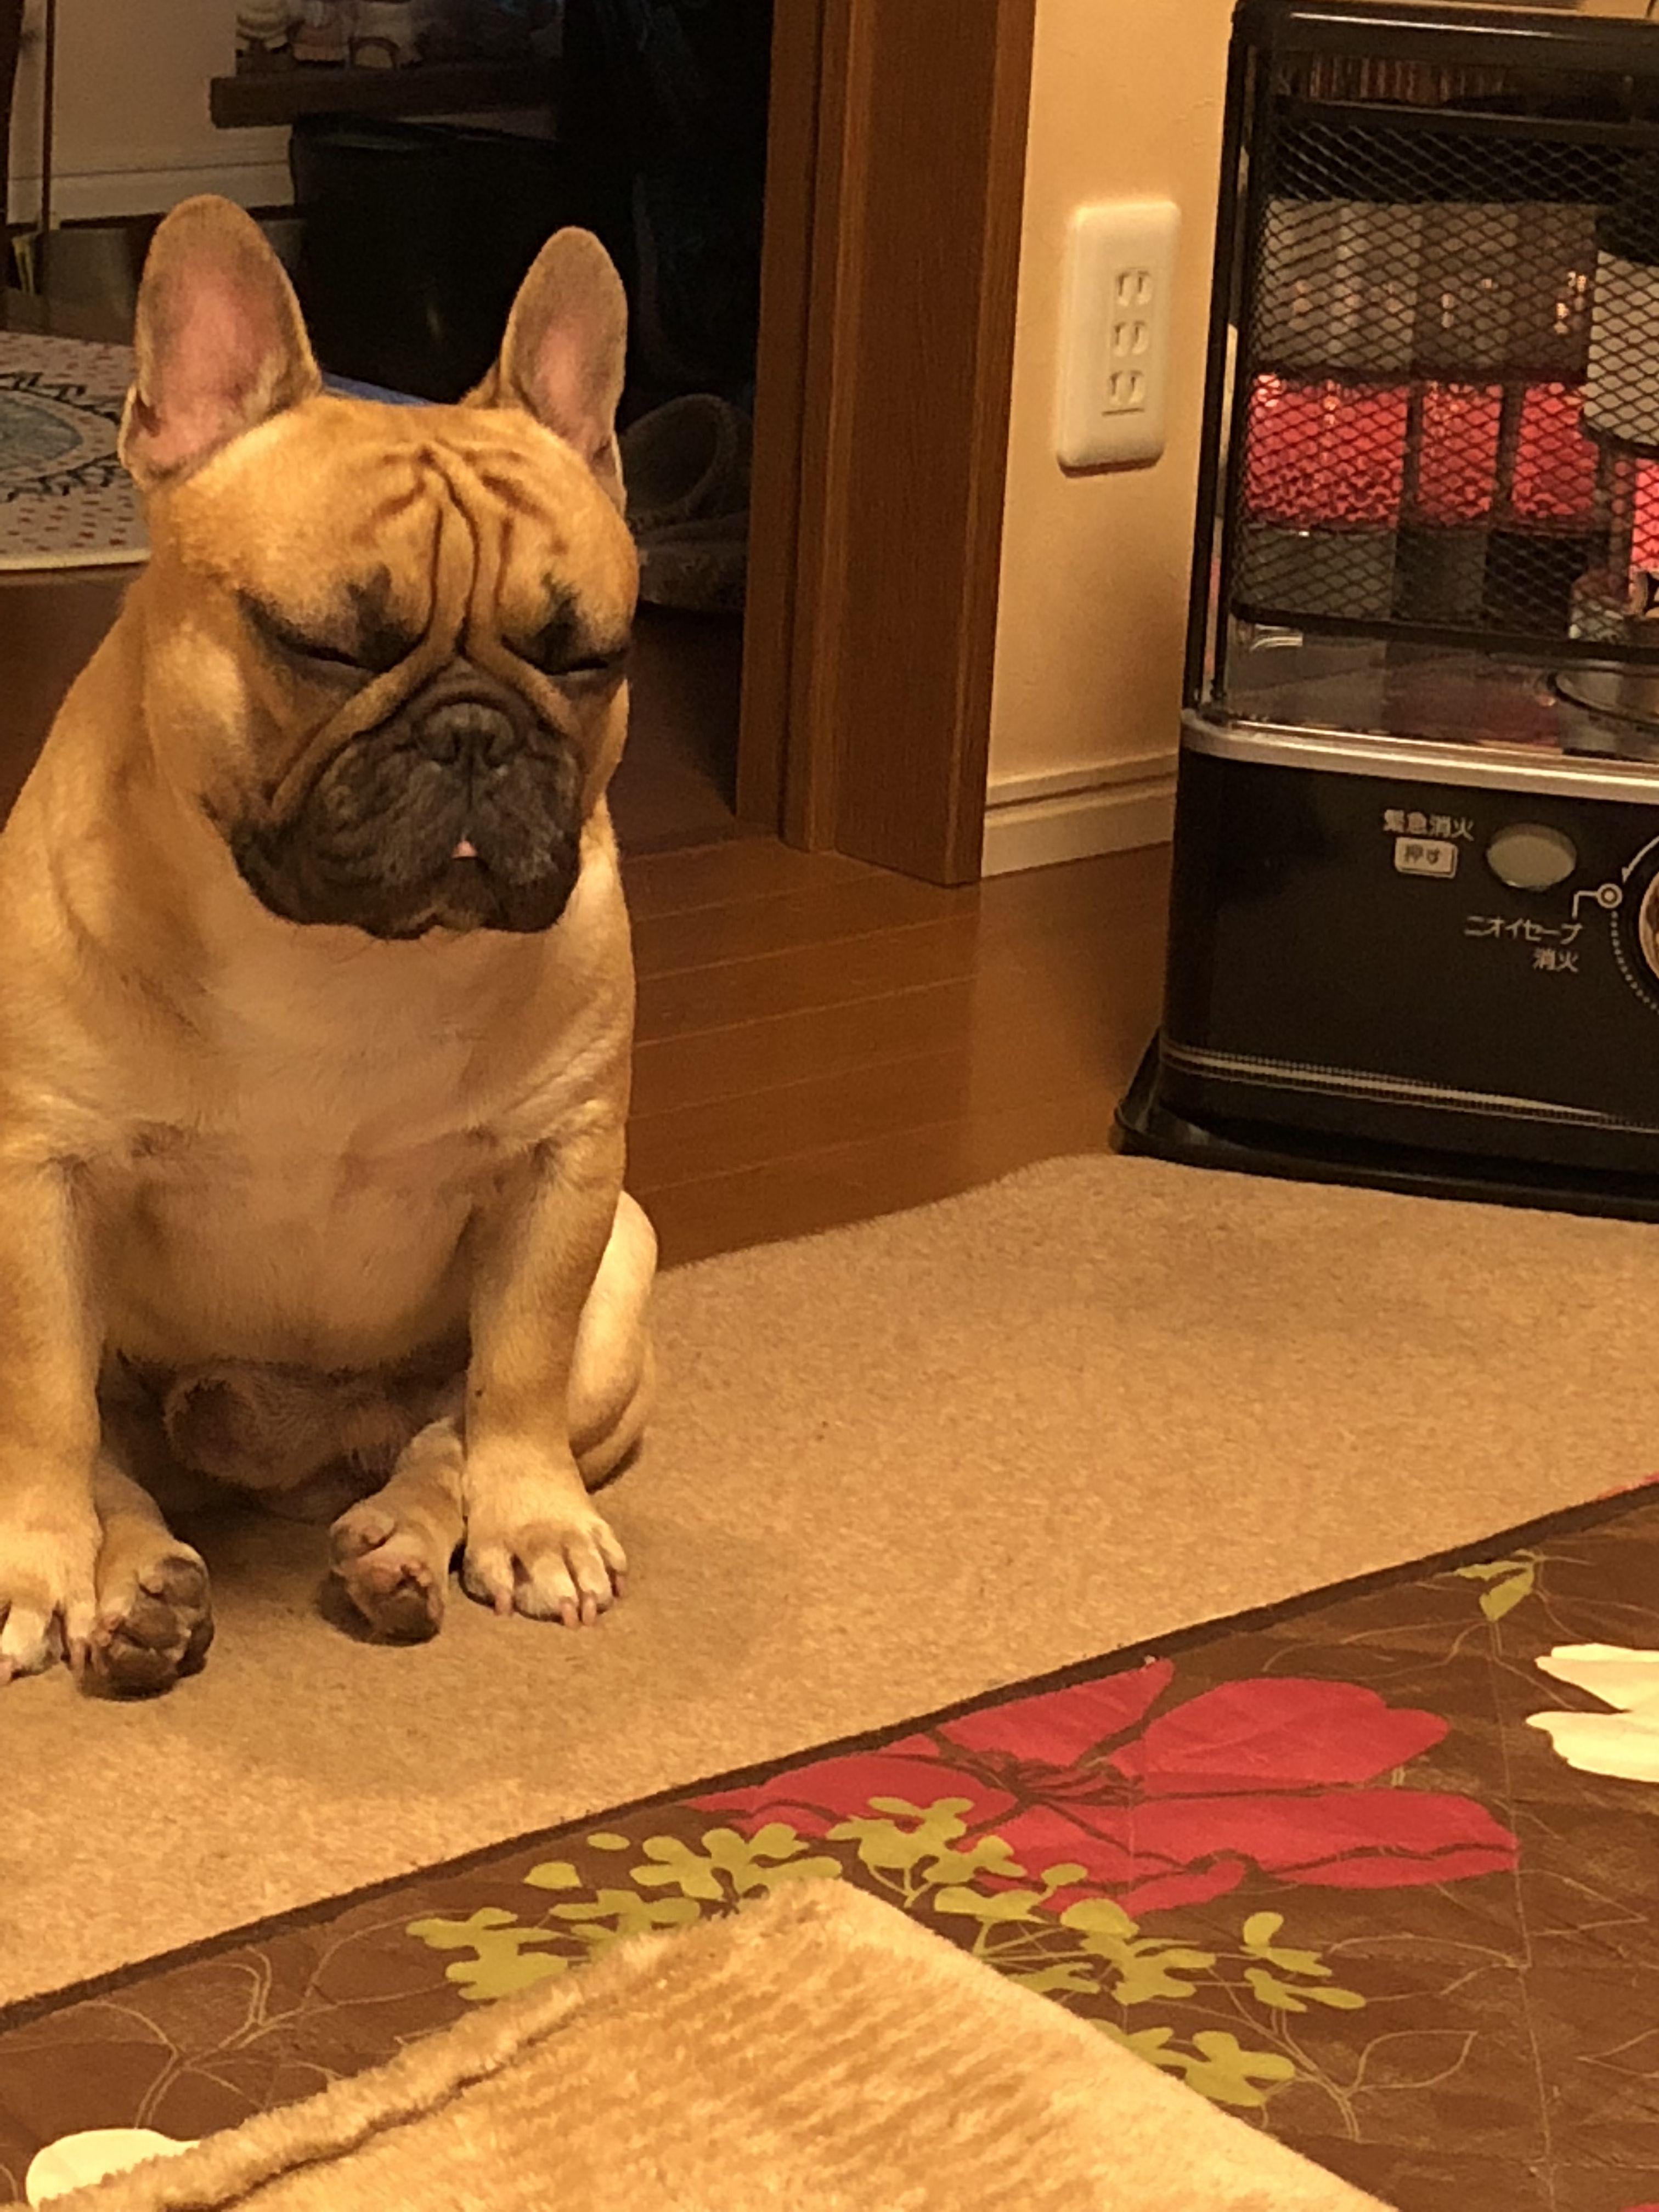 Bully dog by linda boyen on frenchies happy dogs i love